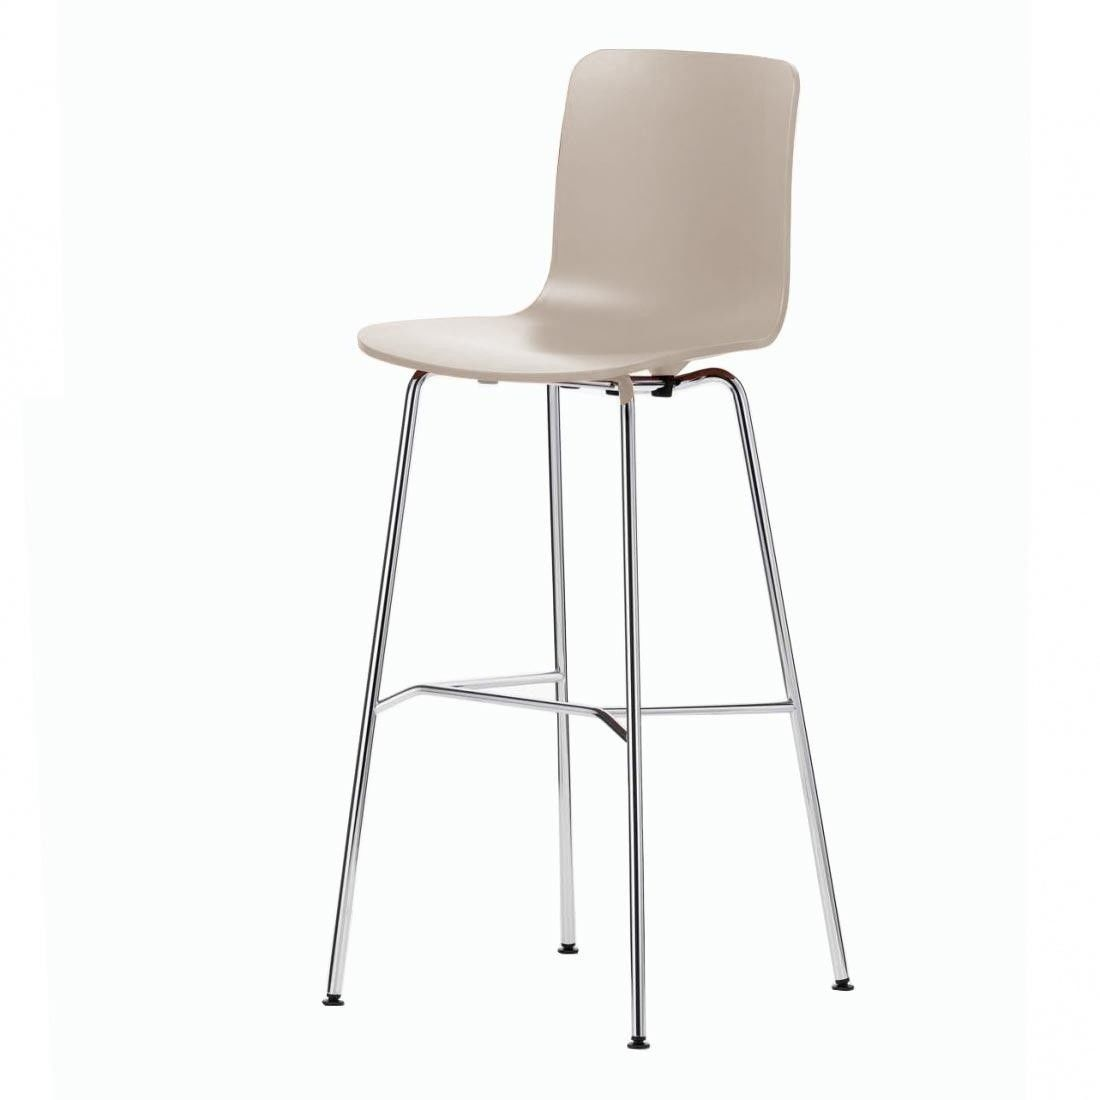 Hal stool high barhocker vitra for Barhocker 78 cm